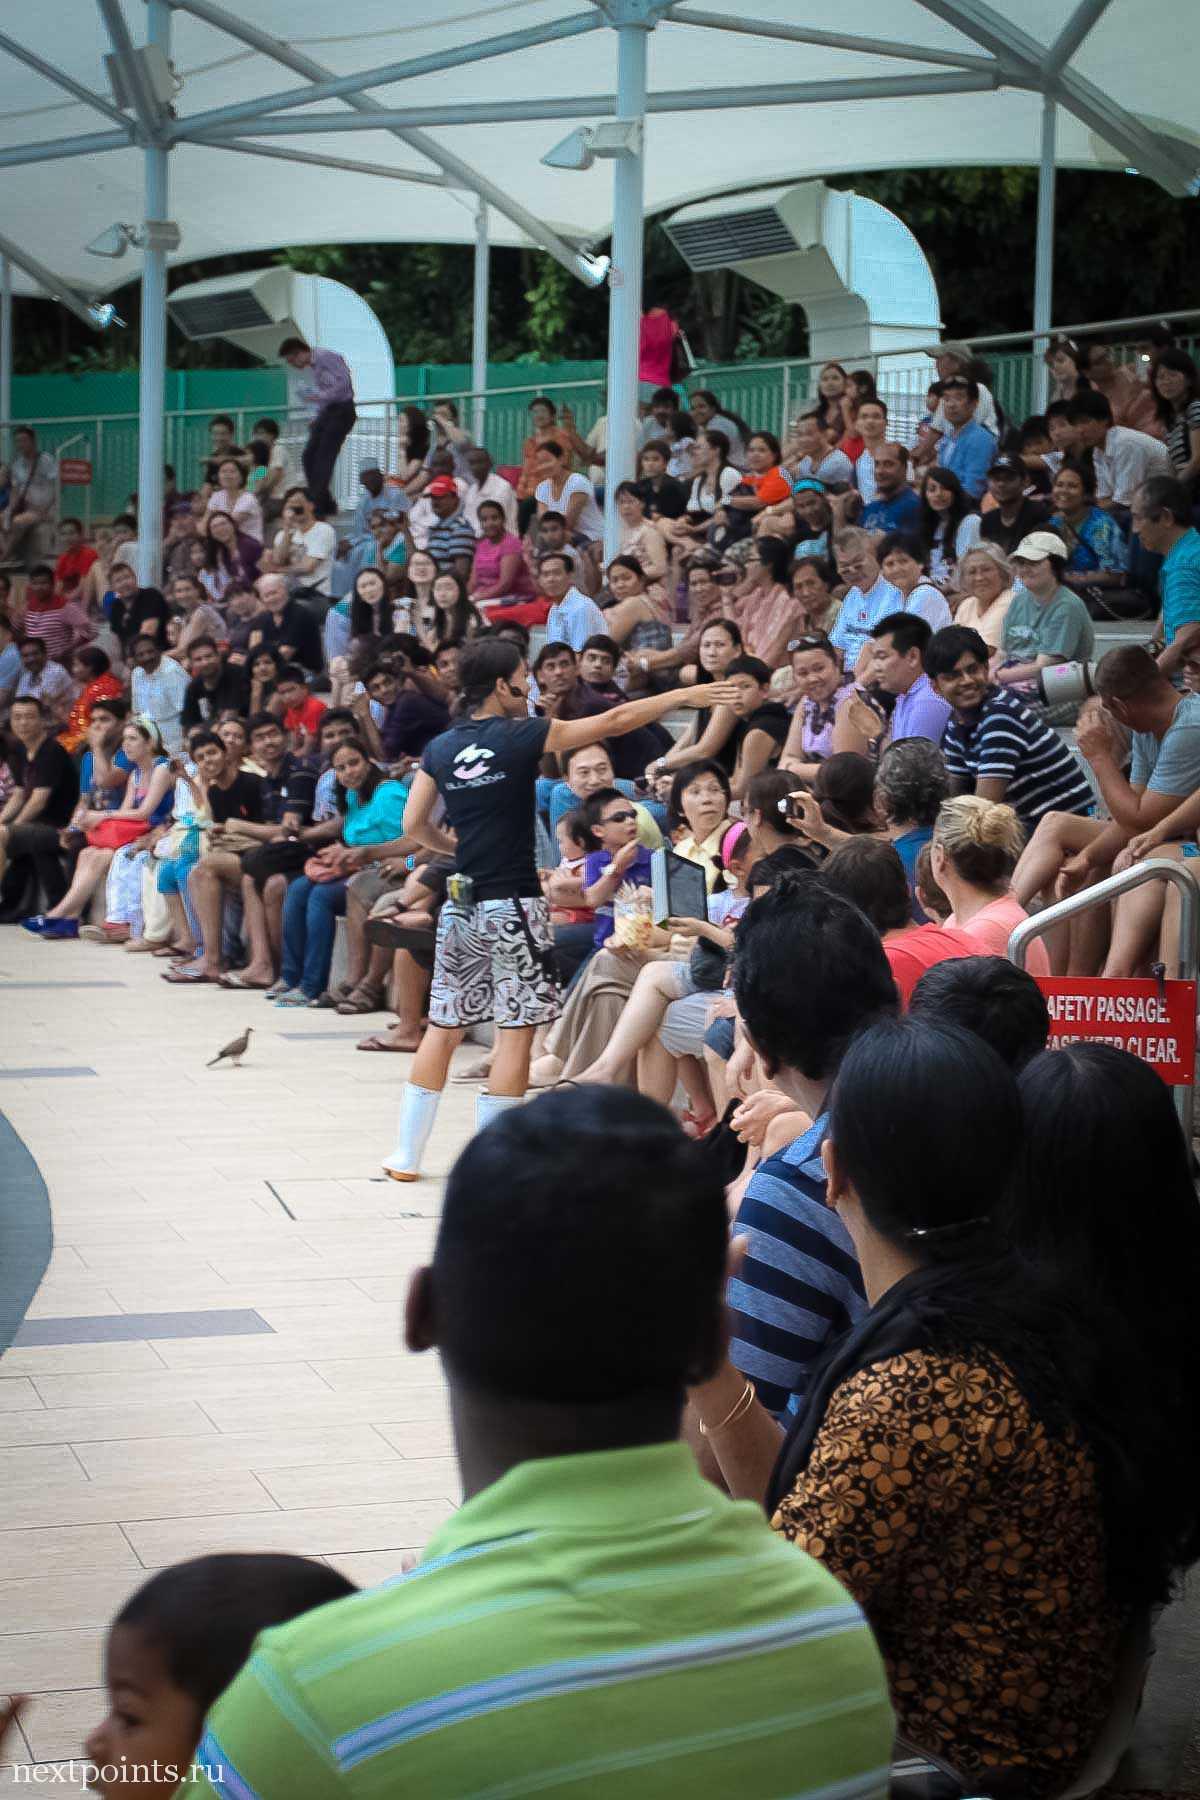 Тренер морских котиков активно общался со зрителями.